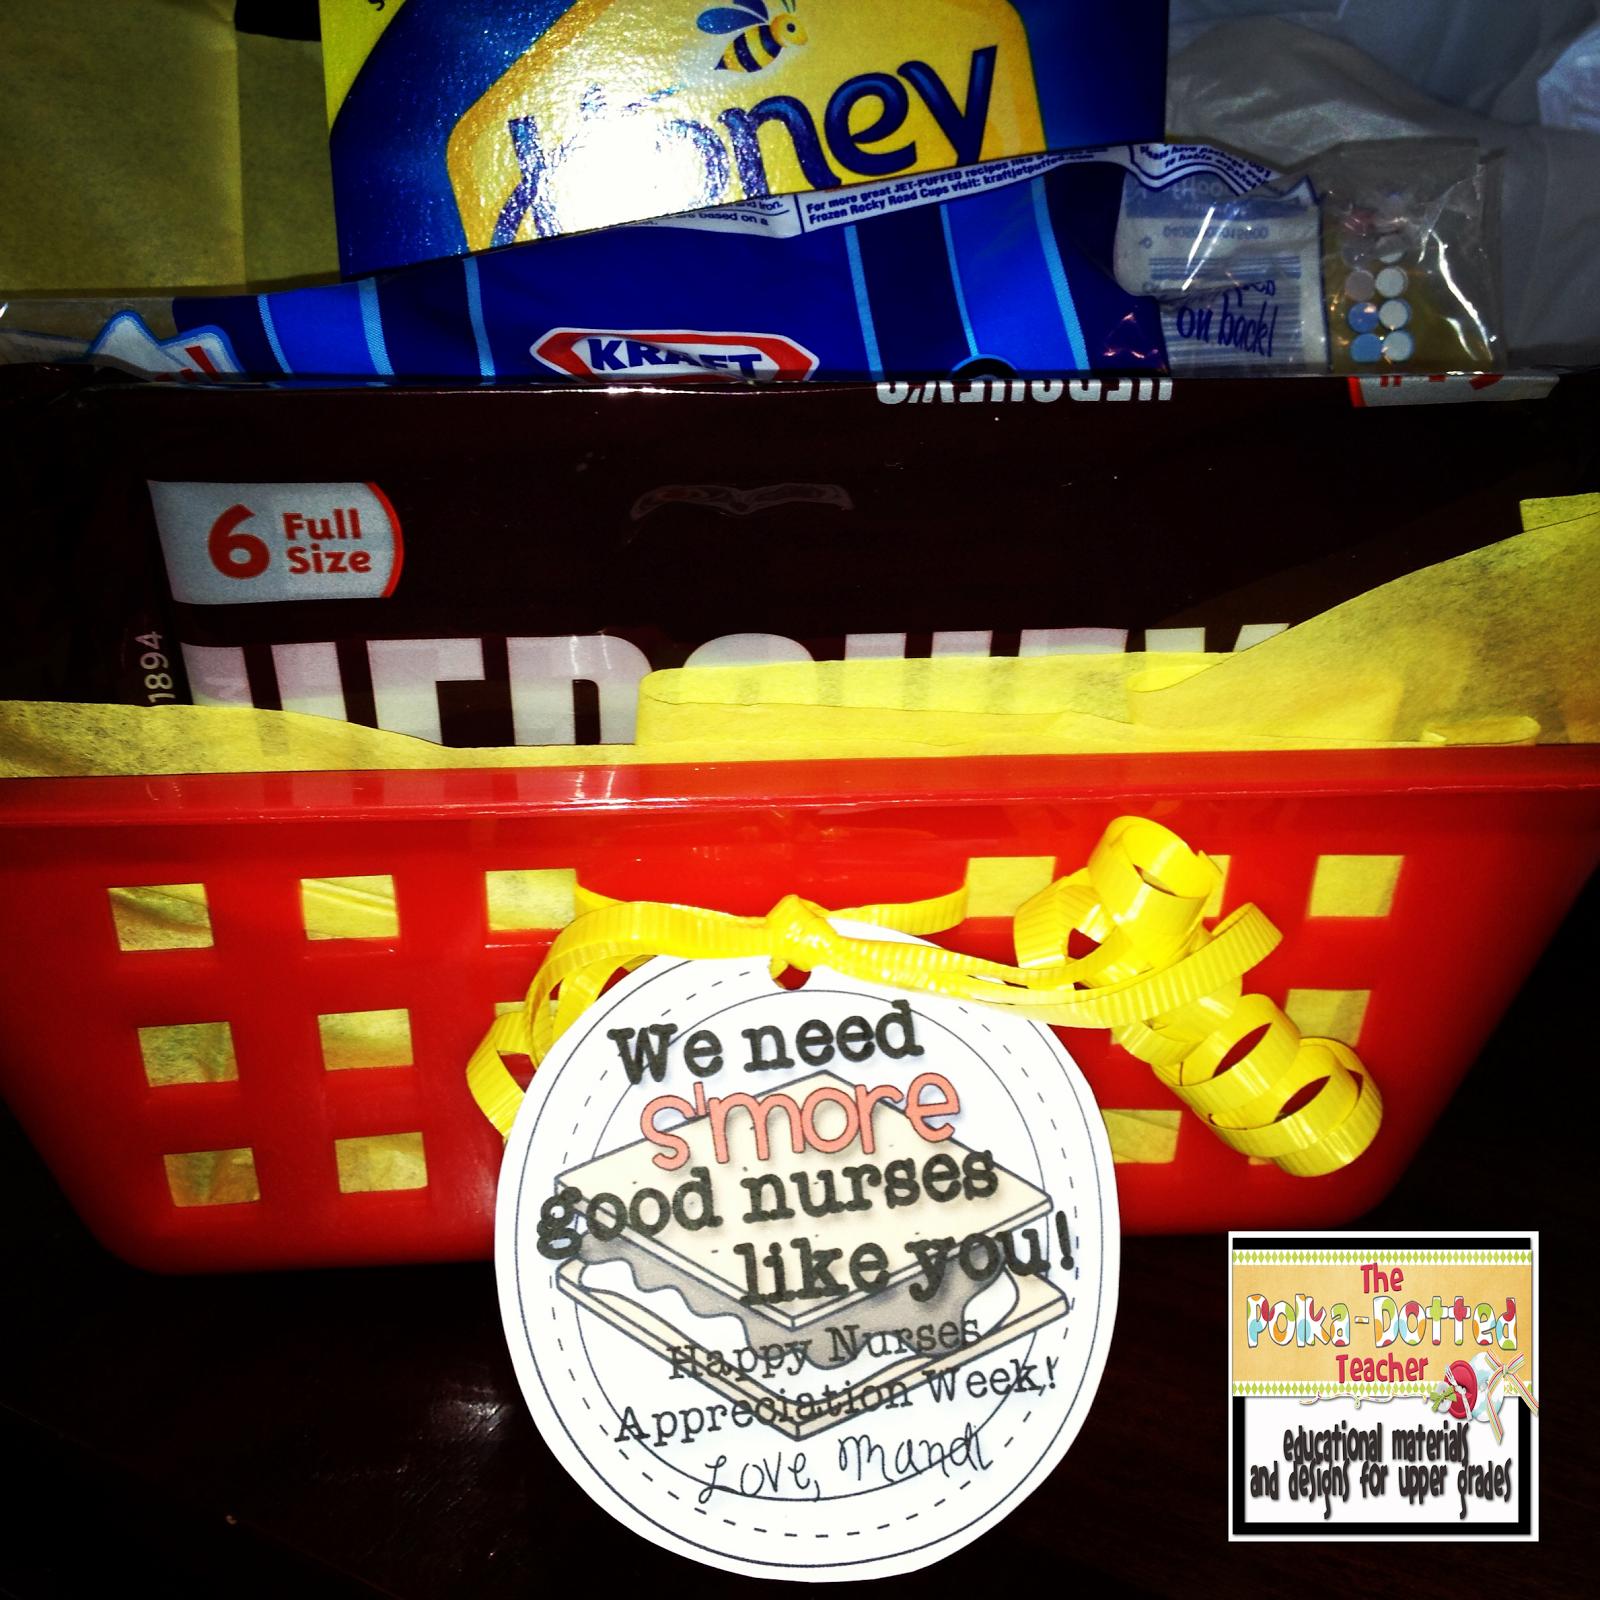 The Polka-dotted Teacher: Teachers/Nurses Appreciation Week Gifts ...